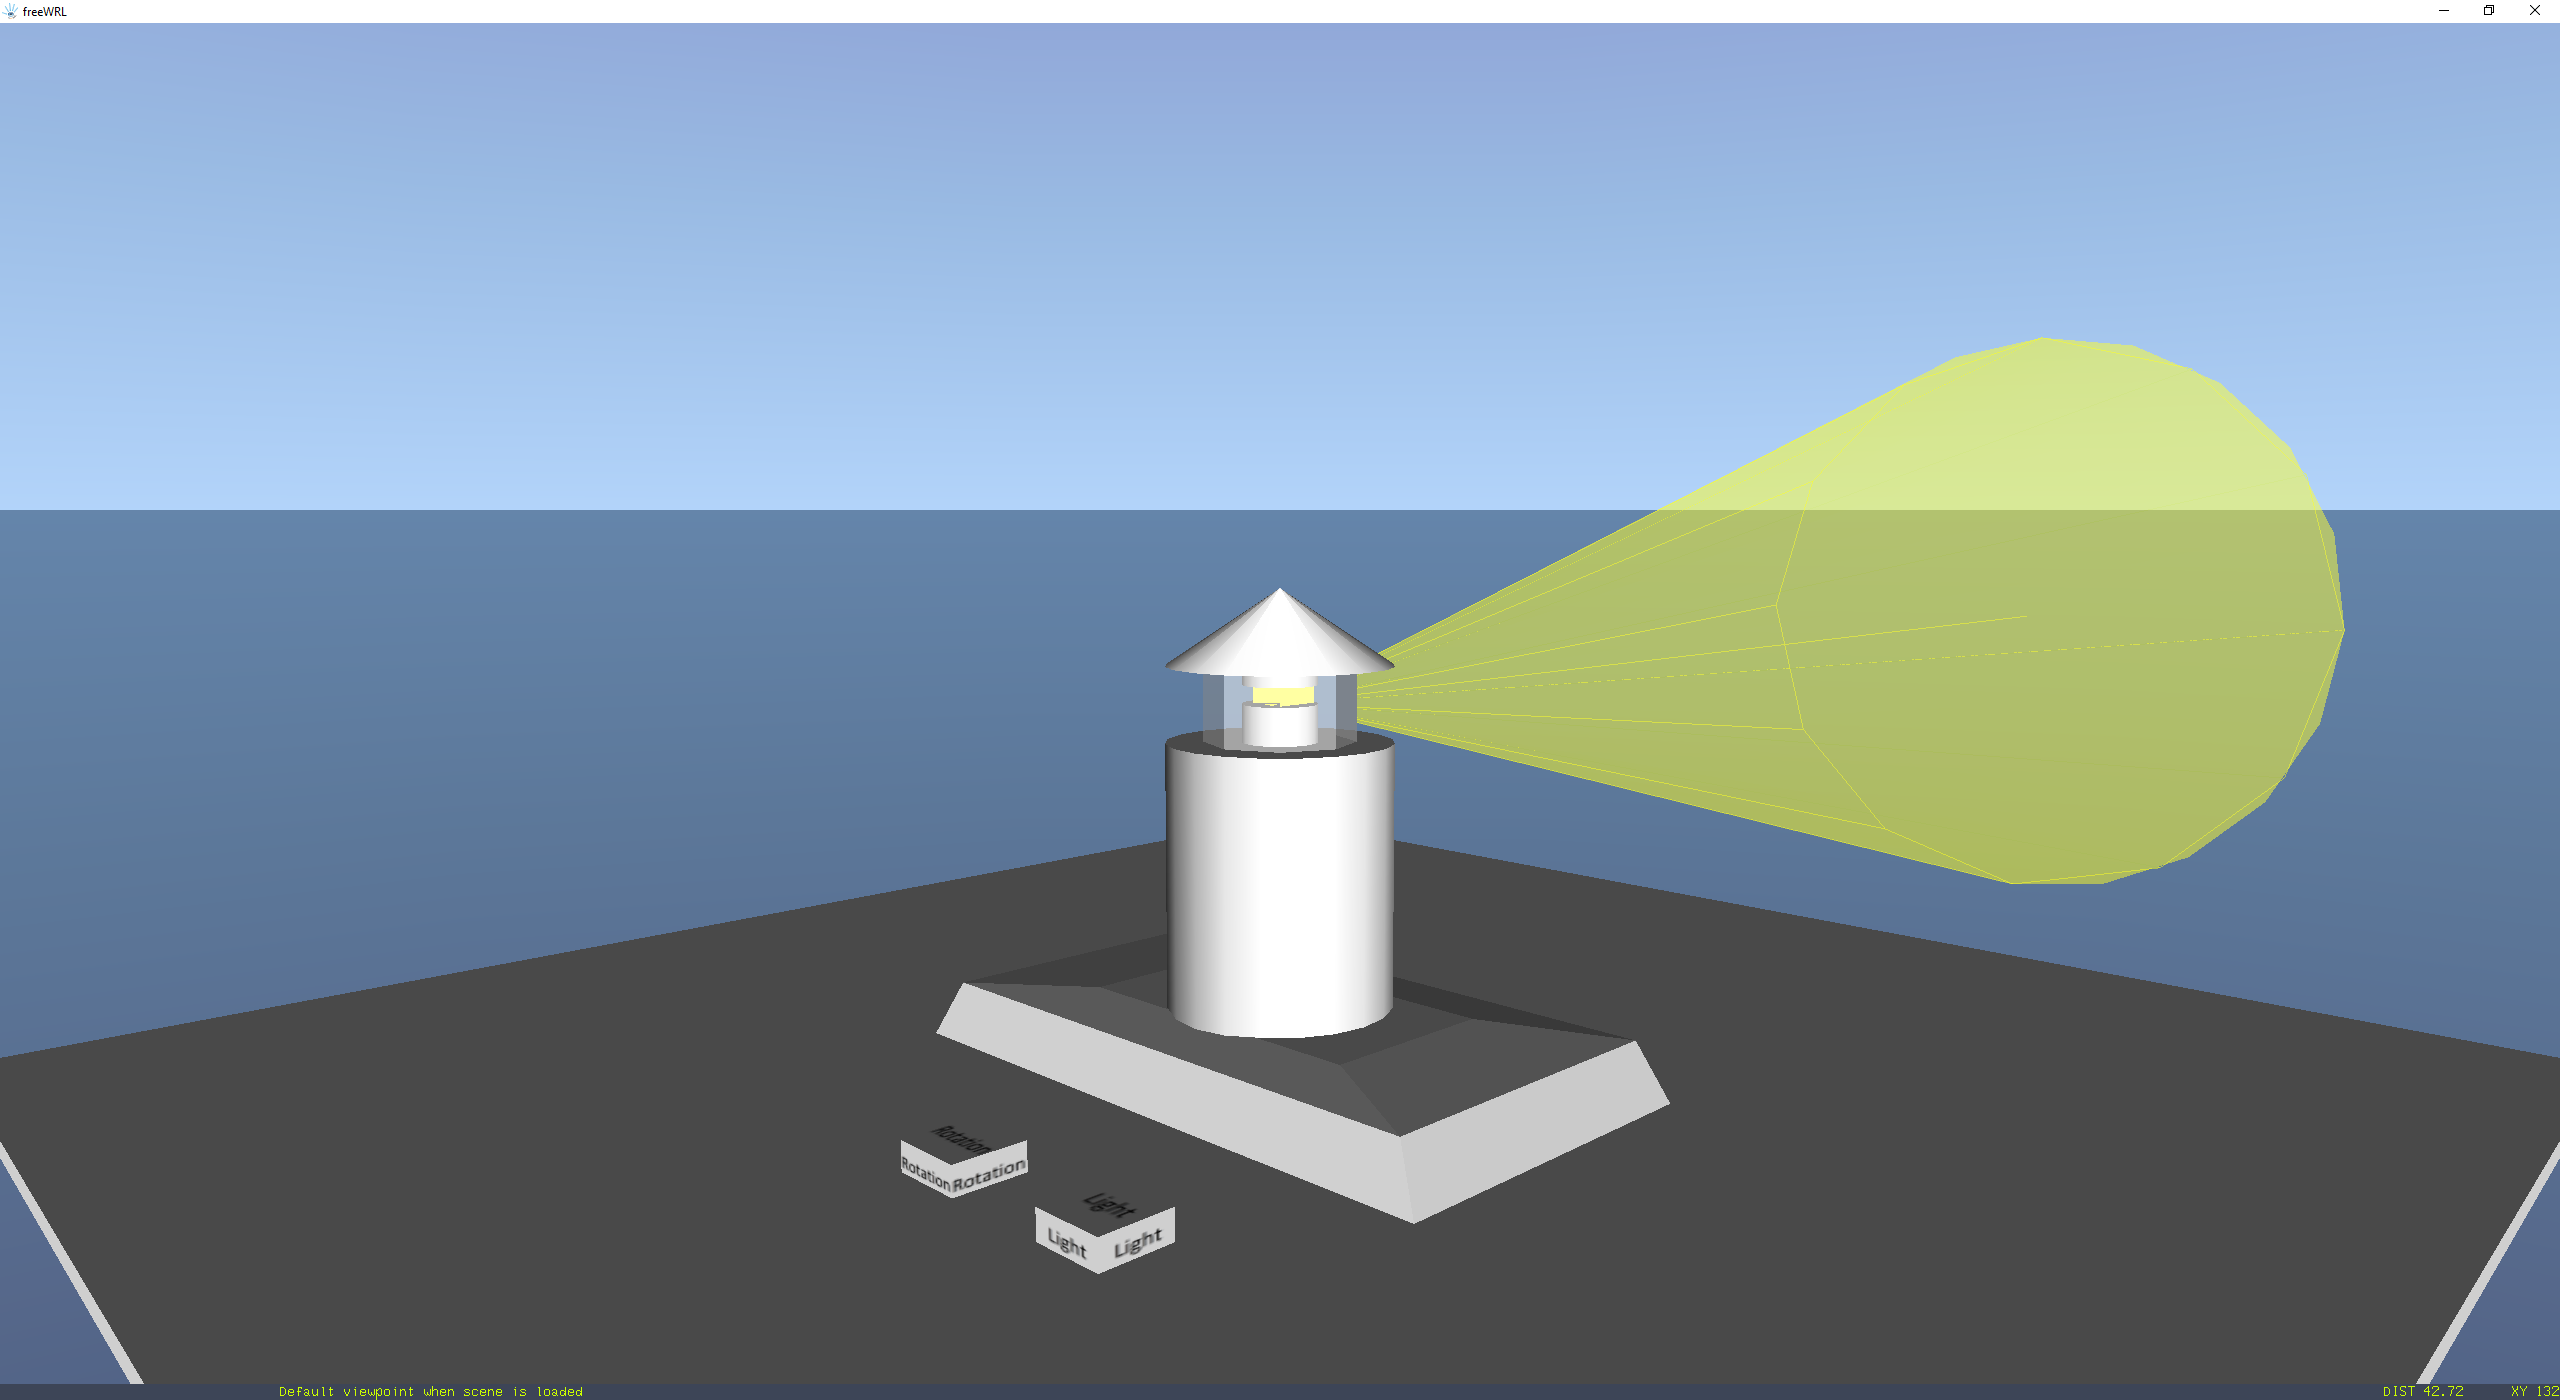 BrennenstuhlTobias/Screenshots/Player/Lighthouse/LightHouse.FreeWRL.png